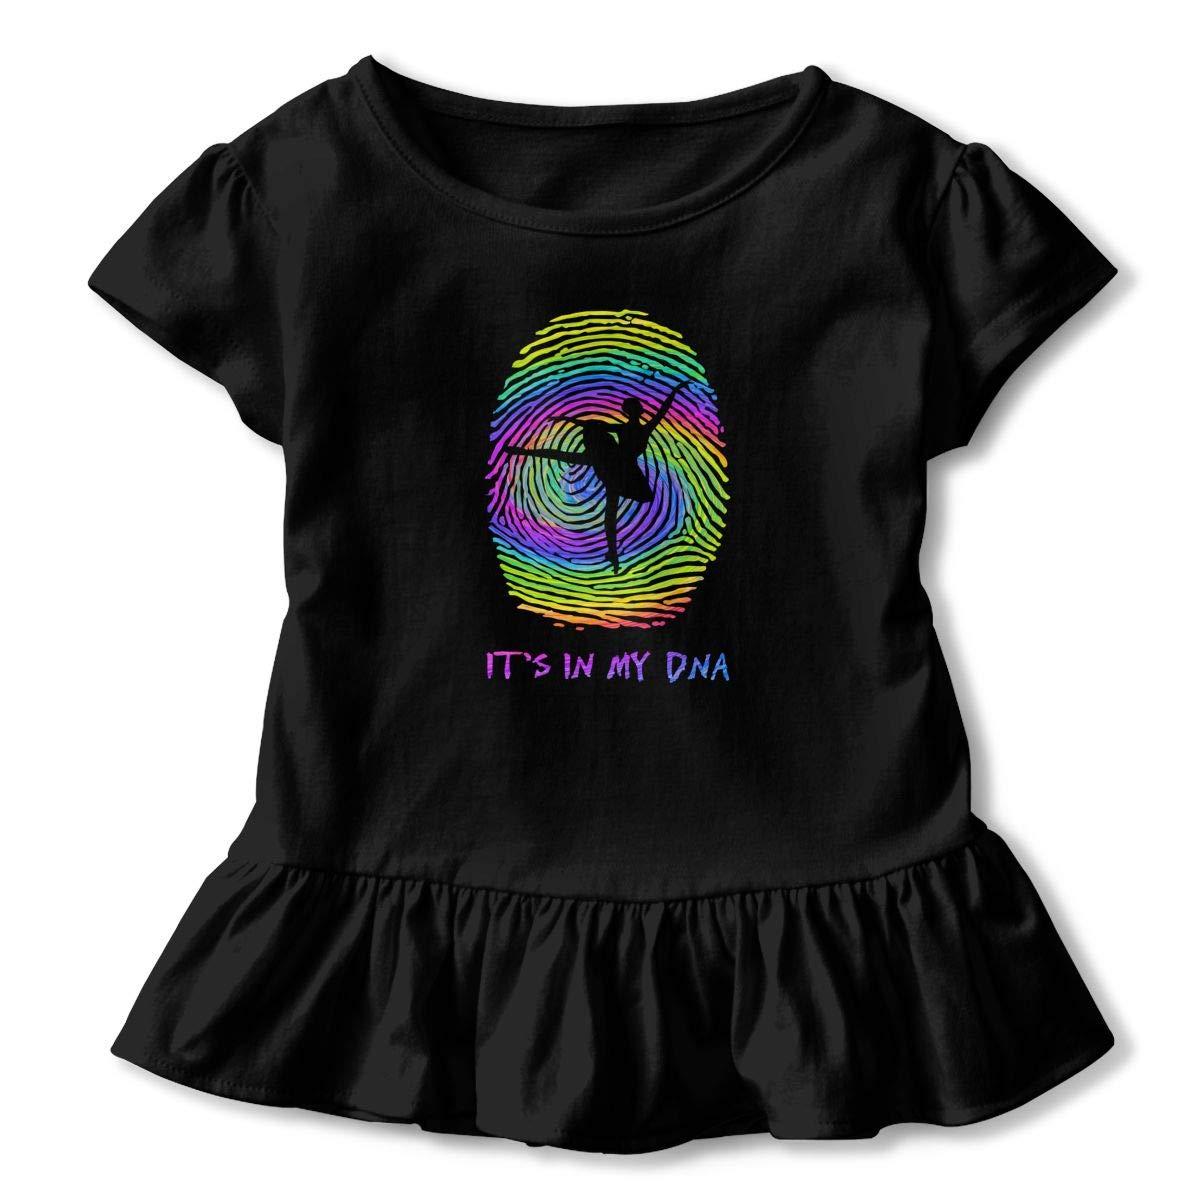 CZnuen Its in My DNA Ballet 2-6T Baby Girls Cotton Jersey Short Sleeve Ruffle Tee